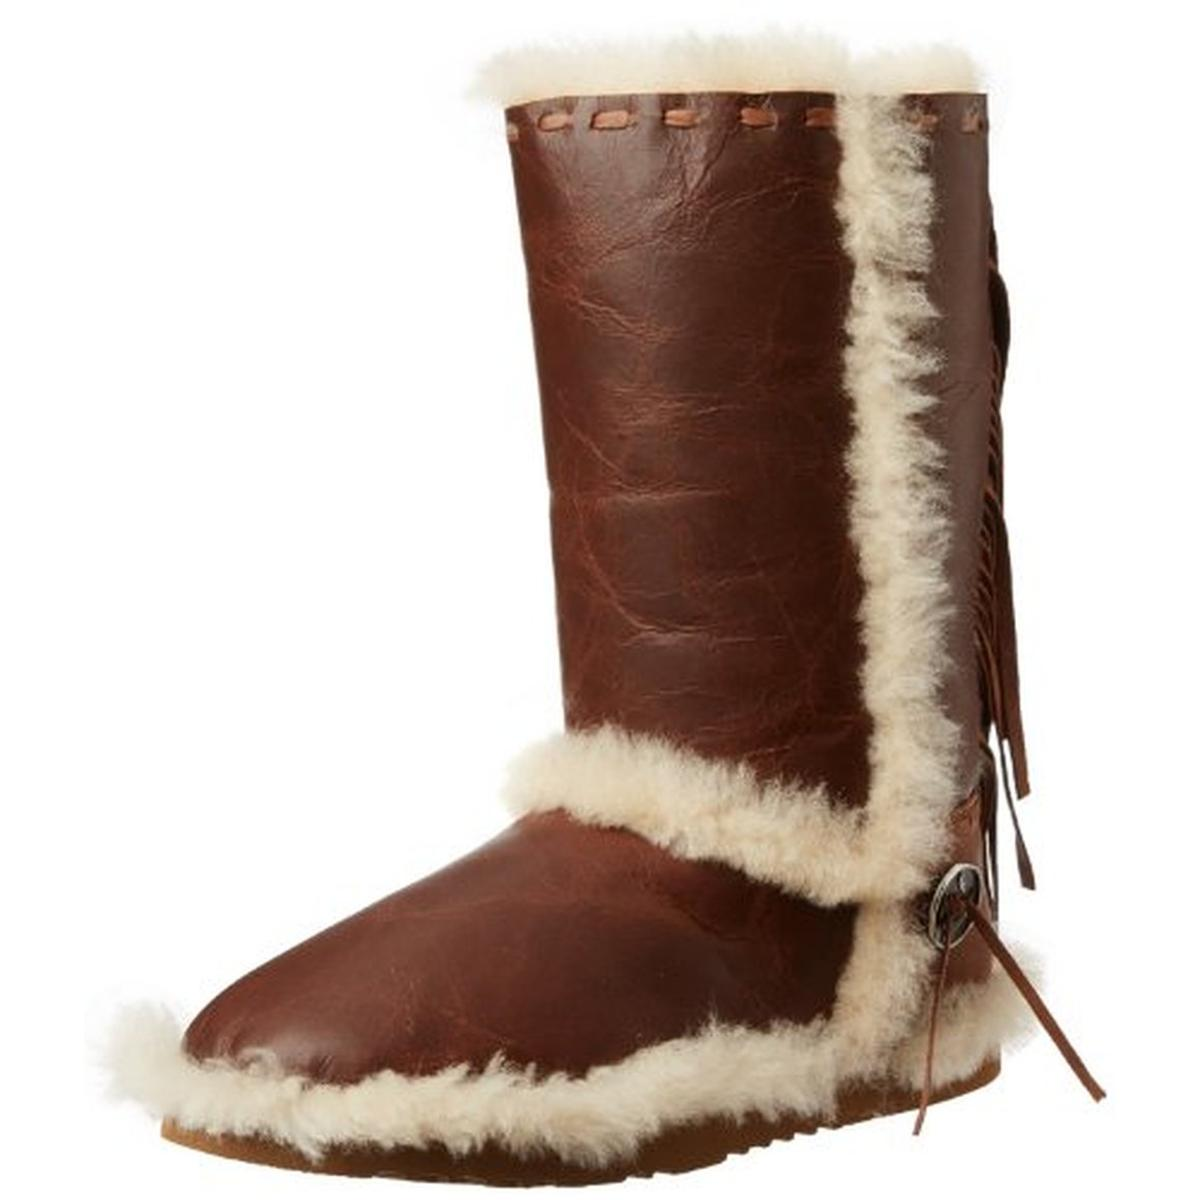 Koolaburra Womens Targan Leather Mid-Calf Moccasin Boots by Koolaburra